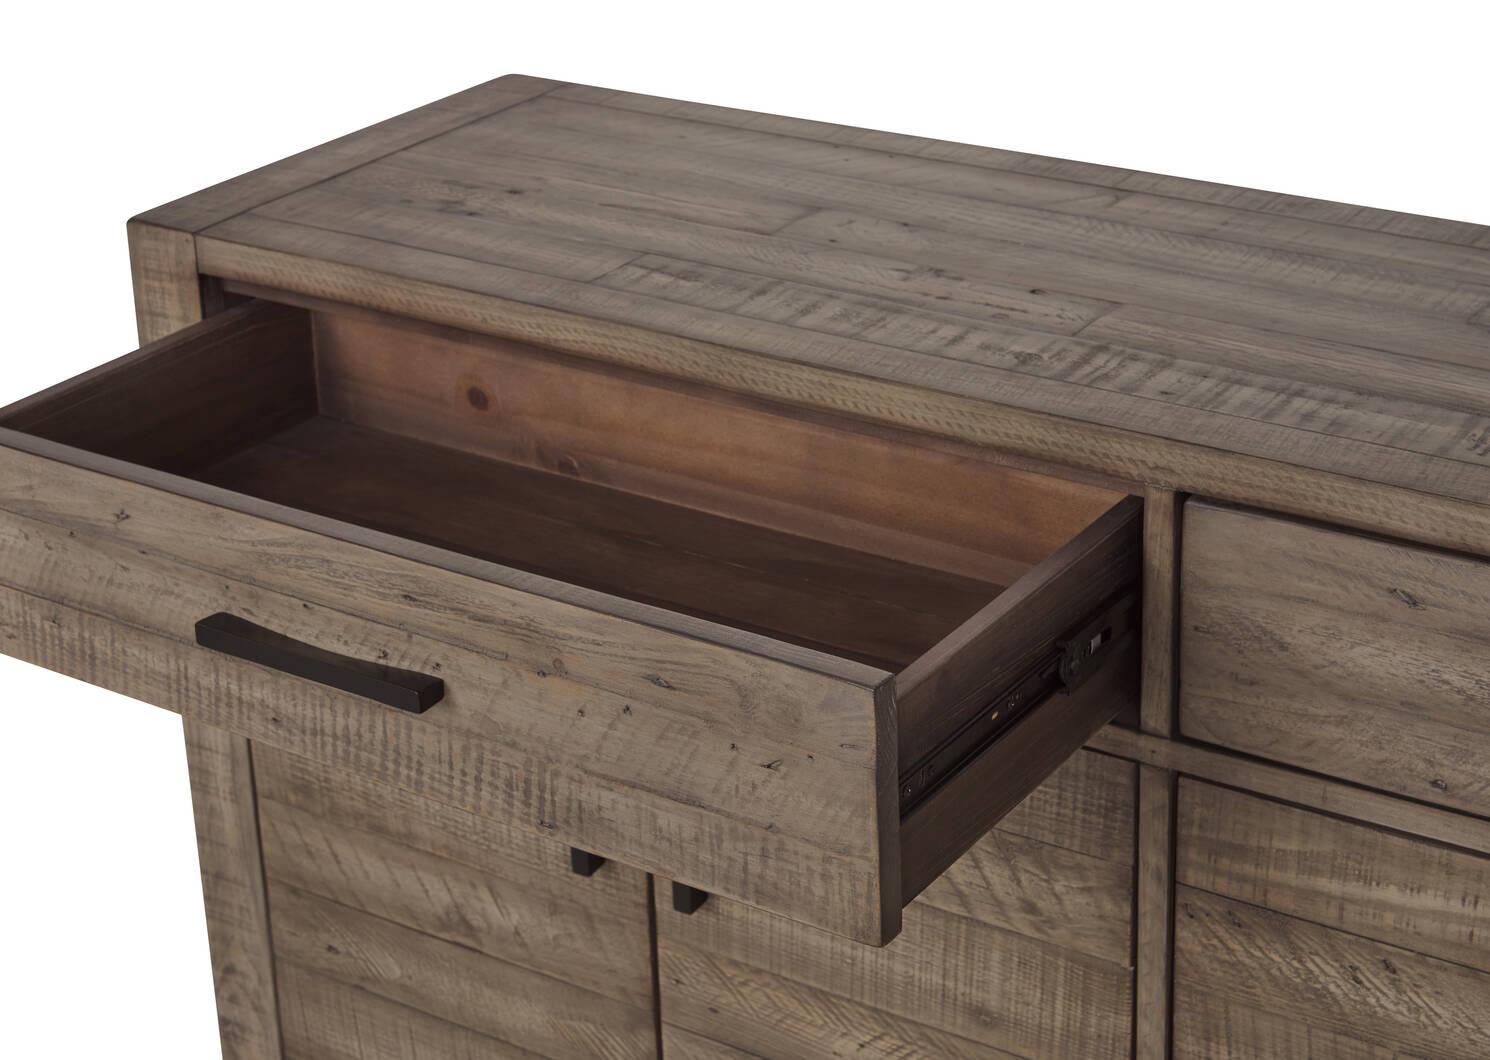 Northwood Sideboard -Stanton Driftwood